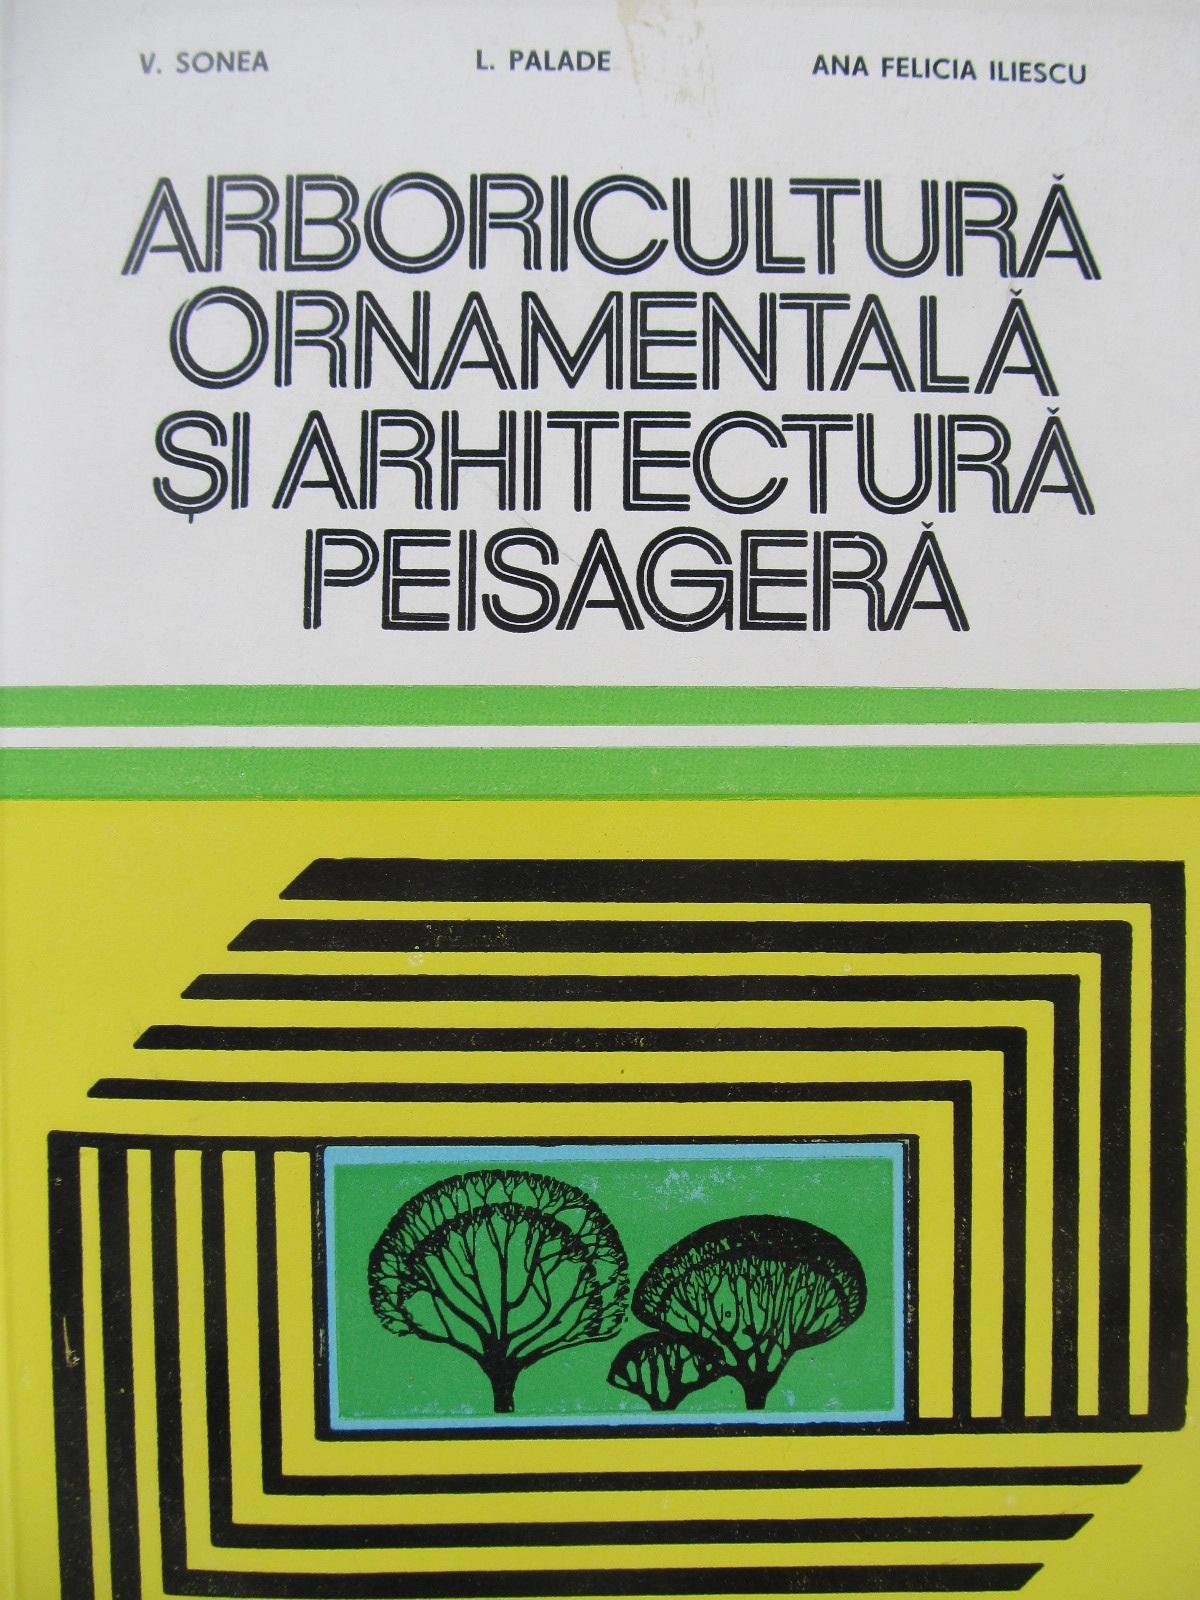 Arboricultura ornamentala si arhitectura peisagera - V. Sonea , ... | Detalii carte